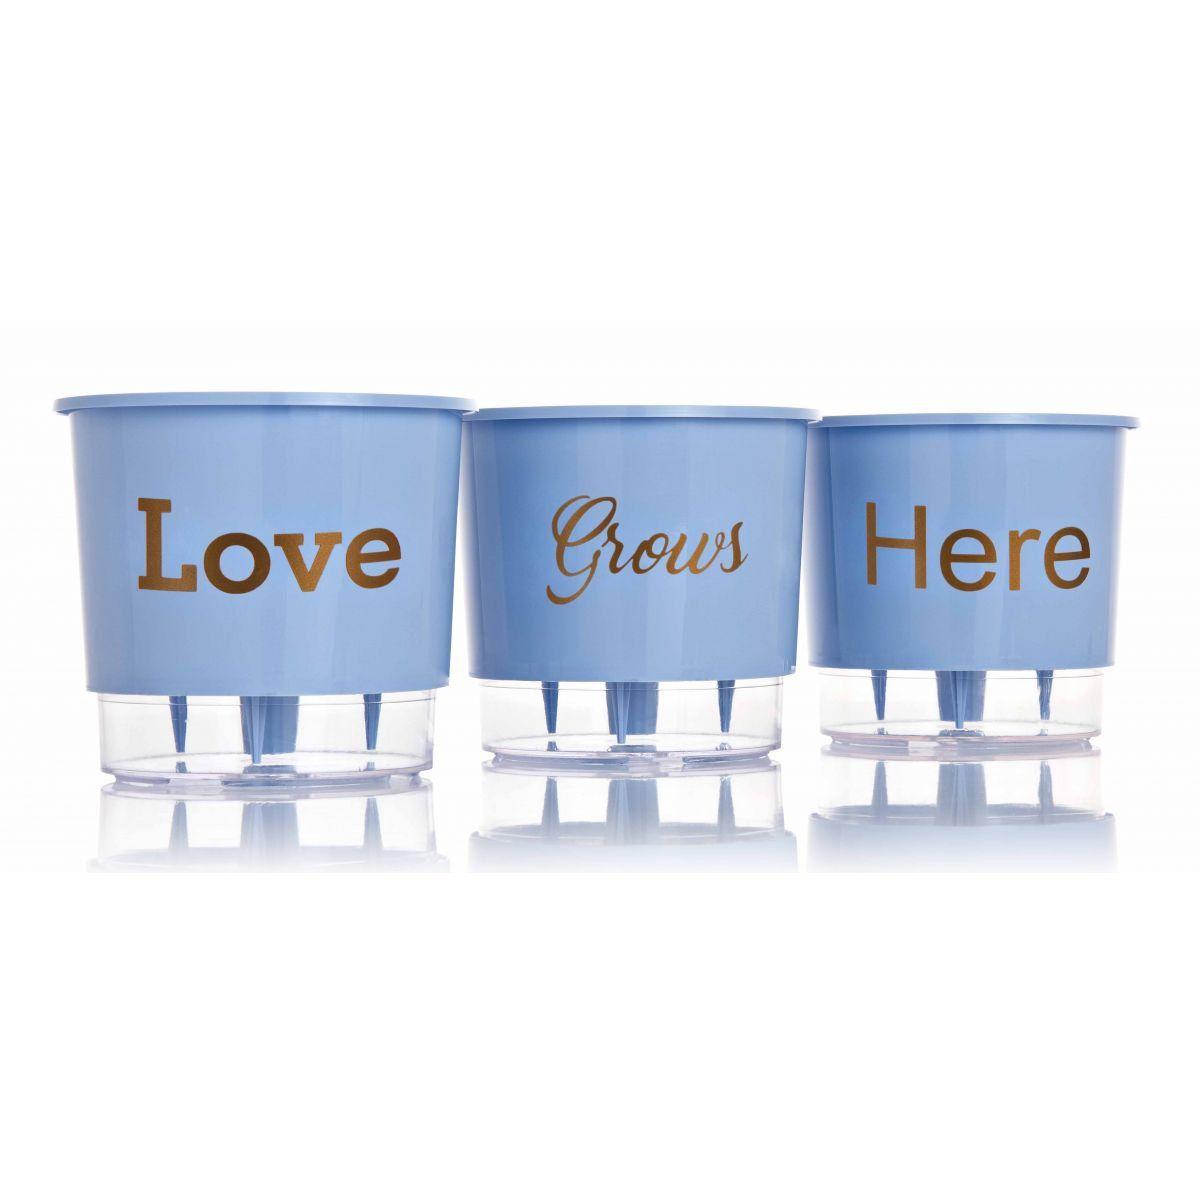 Kit 3 Vasos Autoirrigáveis Pequenos N02 12 cm x 11 cm Love Grows Here Azul Serenity